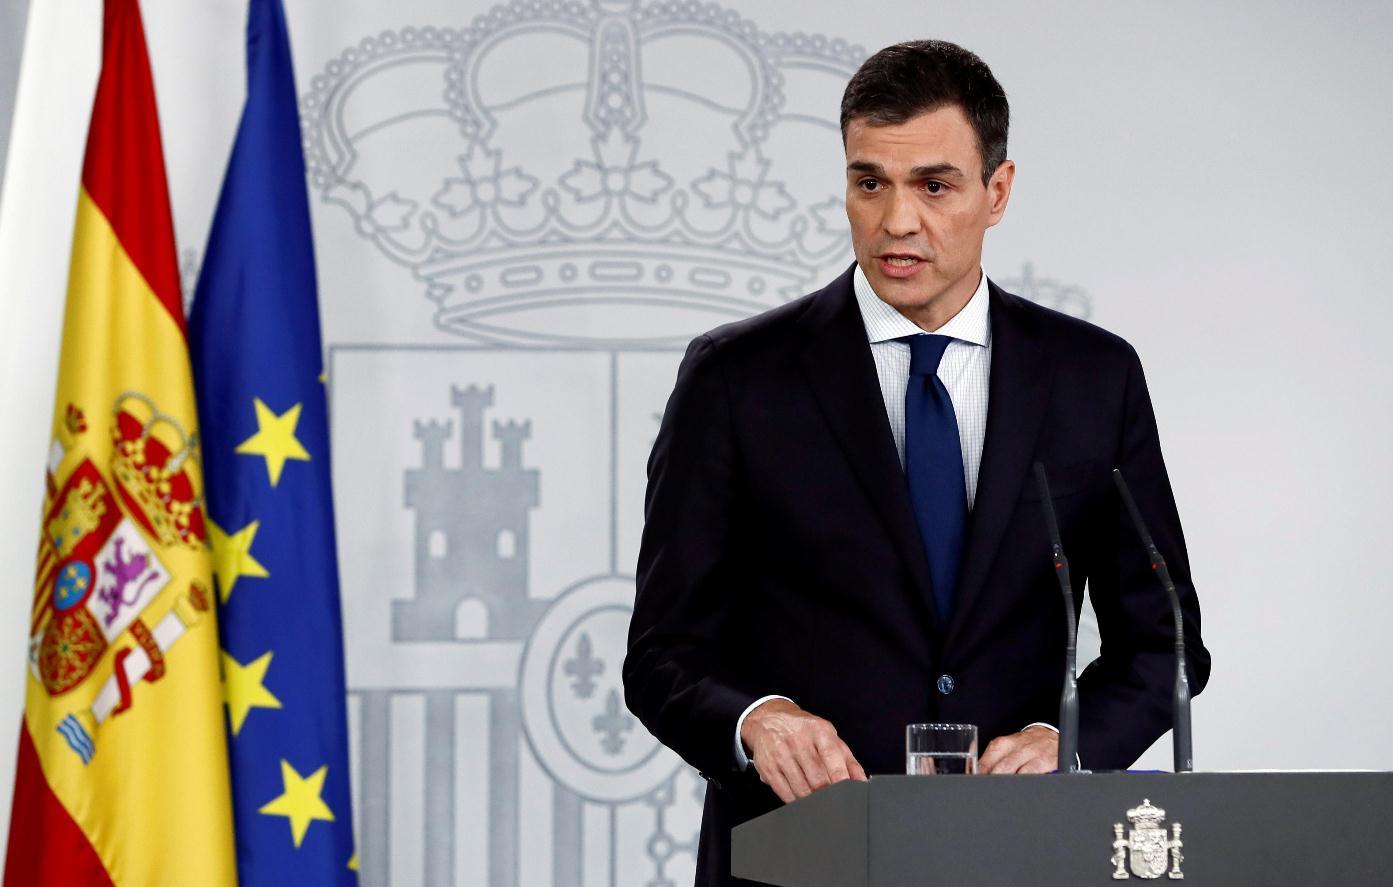 pedro_sanchez_presidente_gobierno_espana_recurso_bbva.